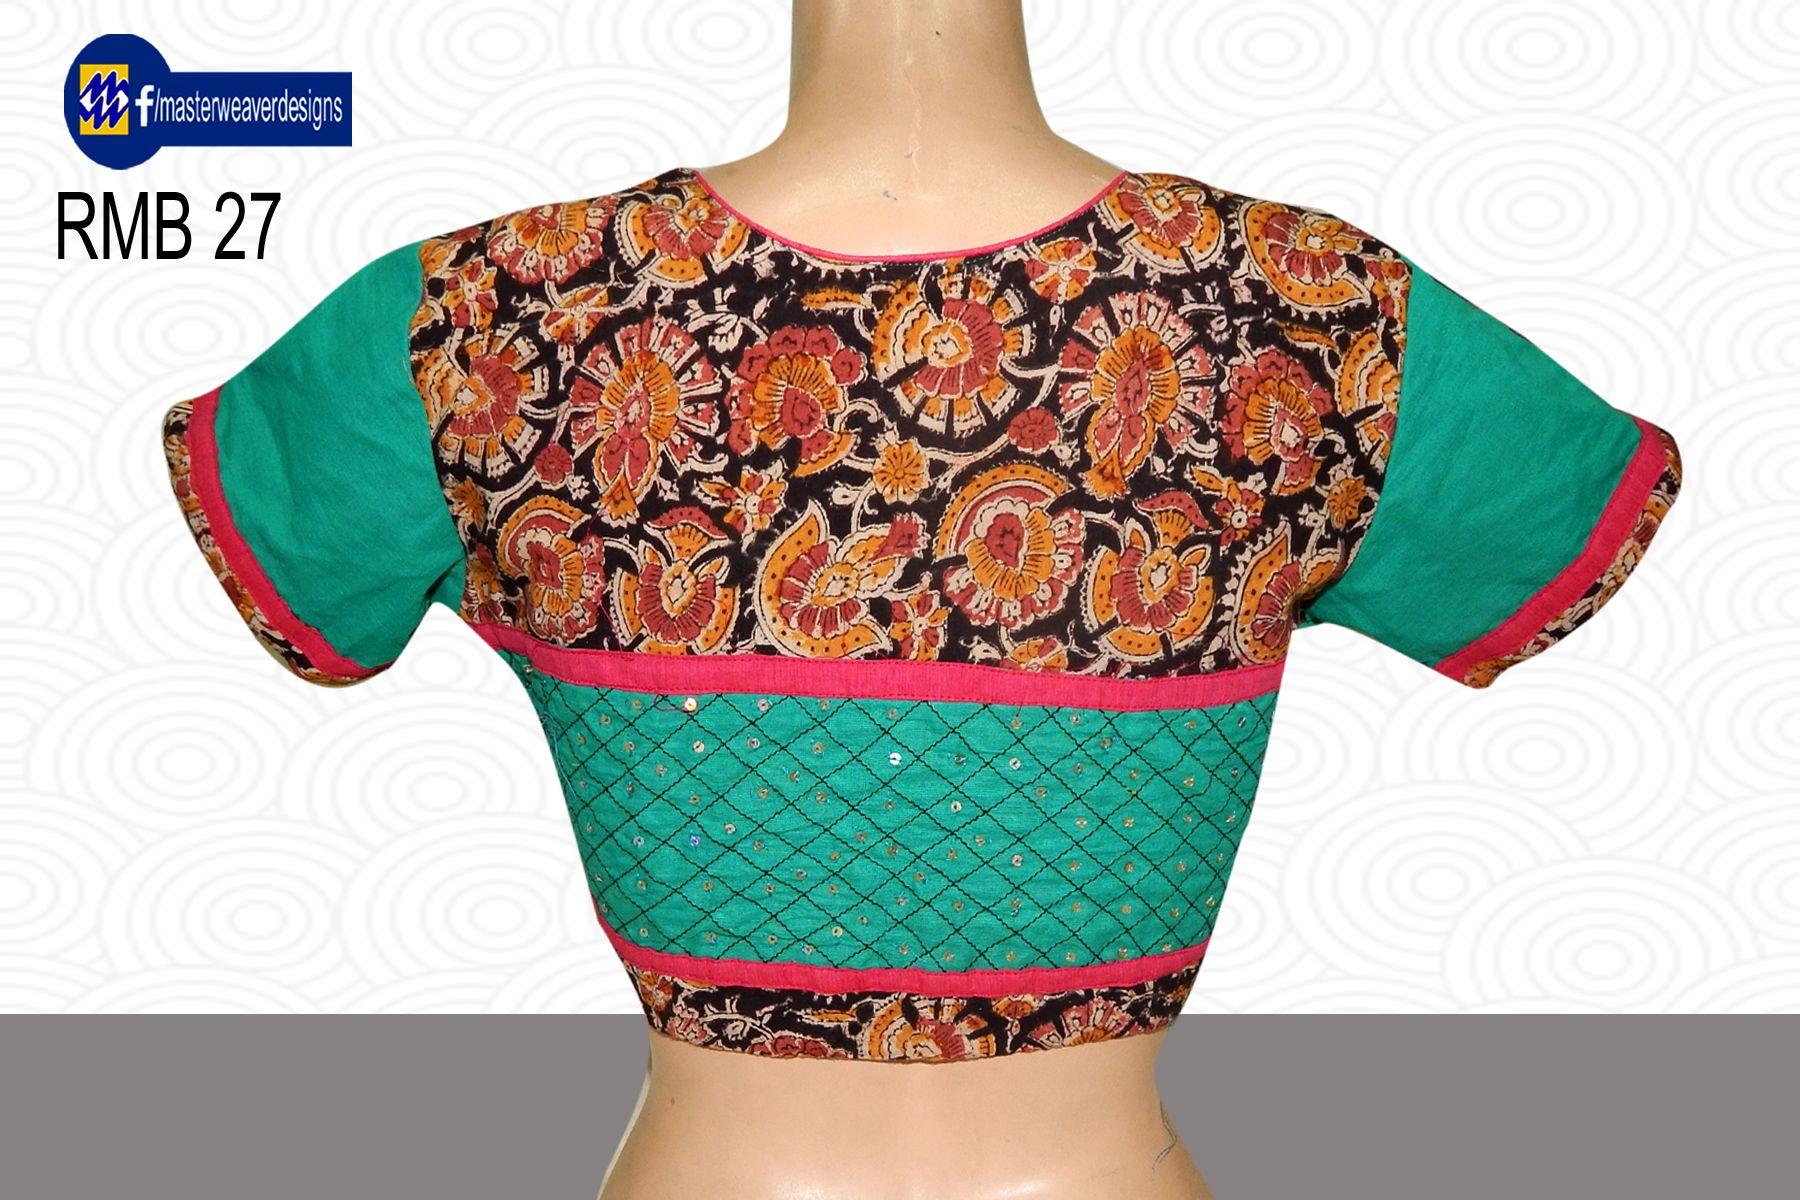 Highneck Kalamkari Readymade Blouse Is Designed With Mangalagiri